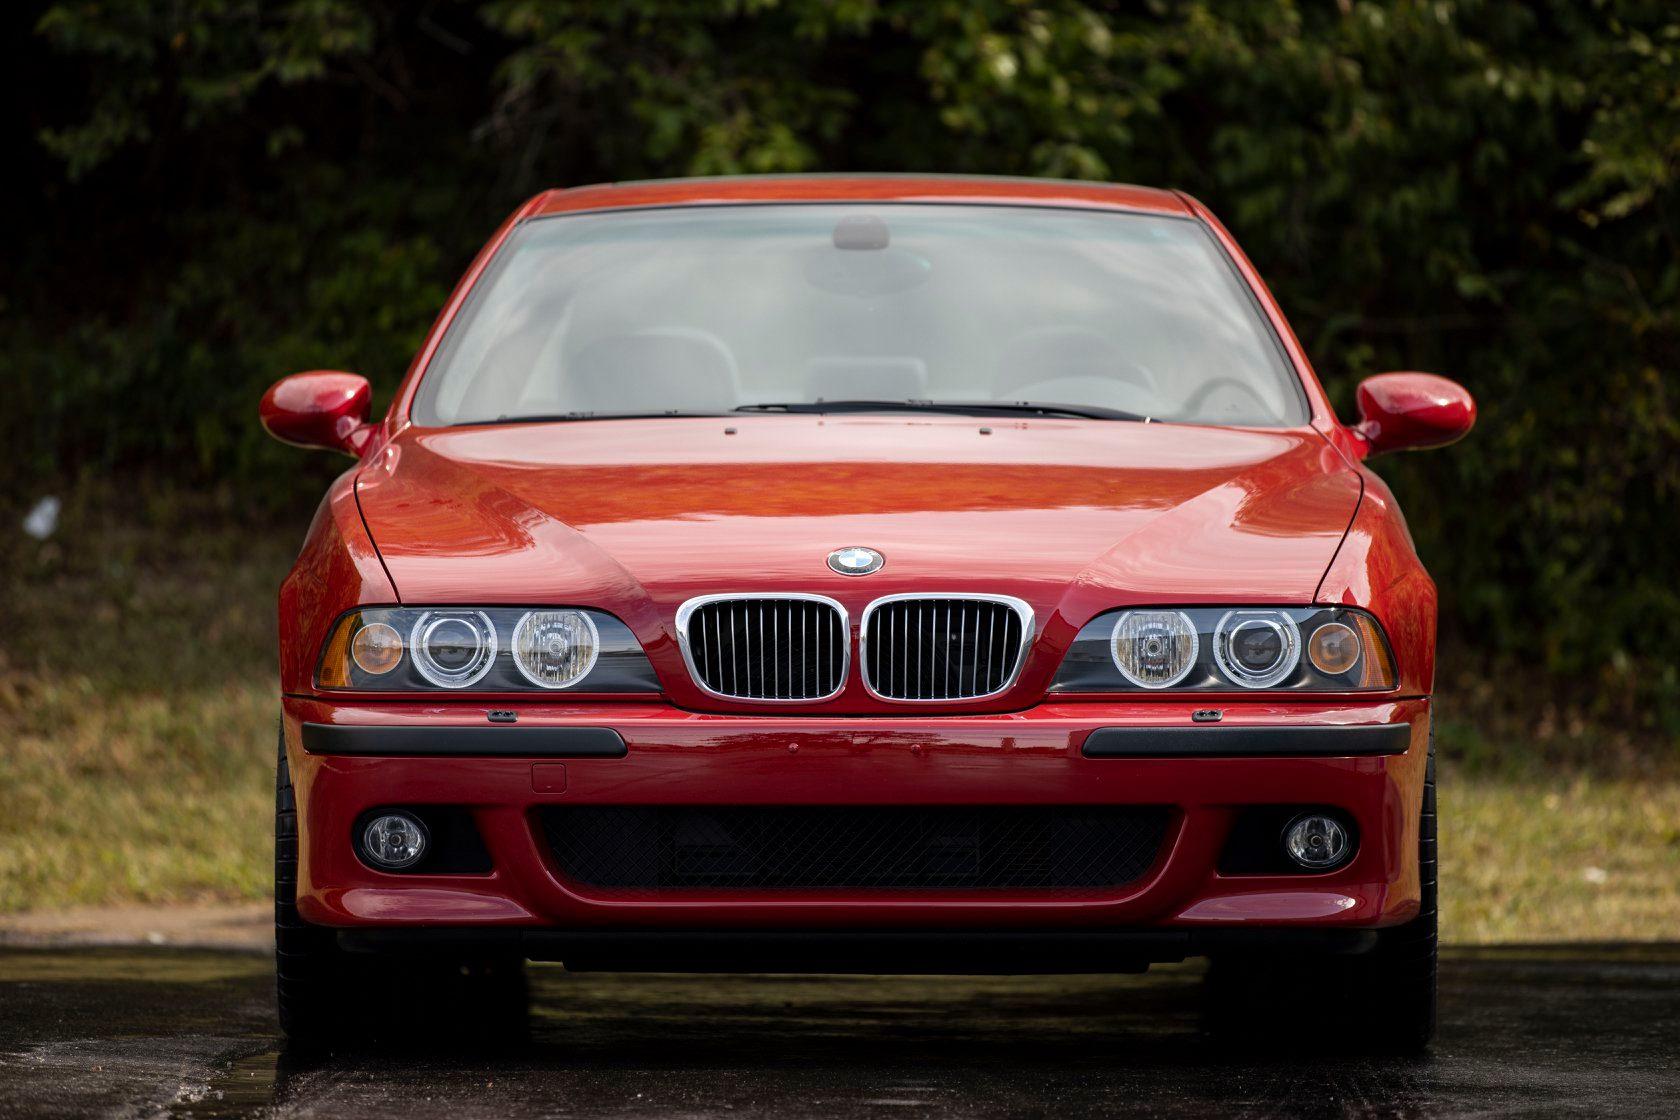 BMW_M5_E39_Imola_Red_0016